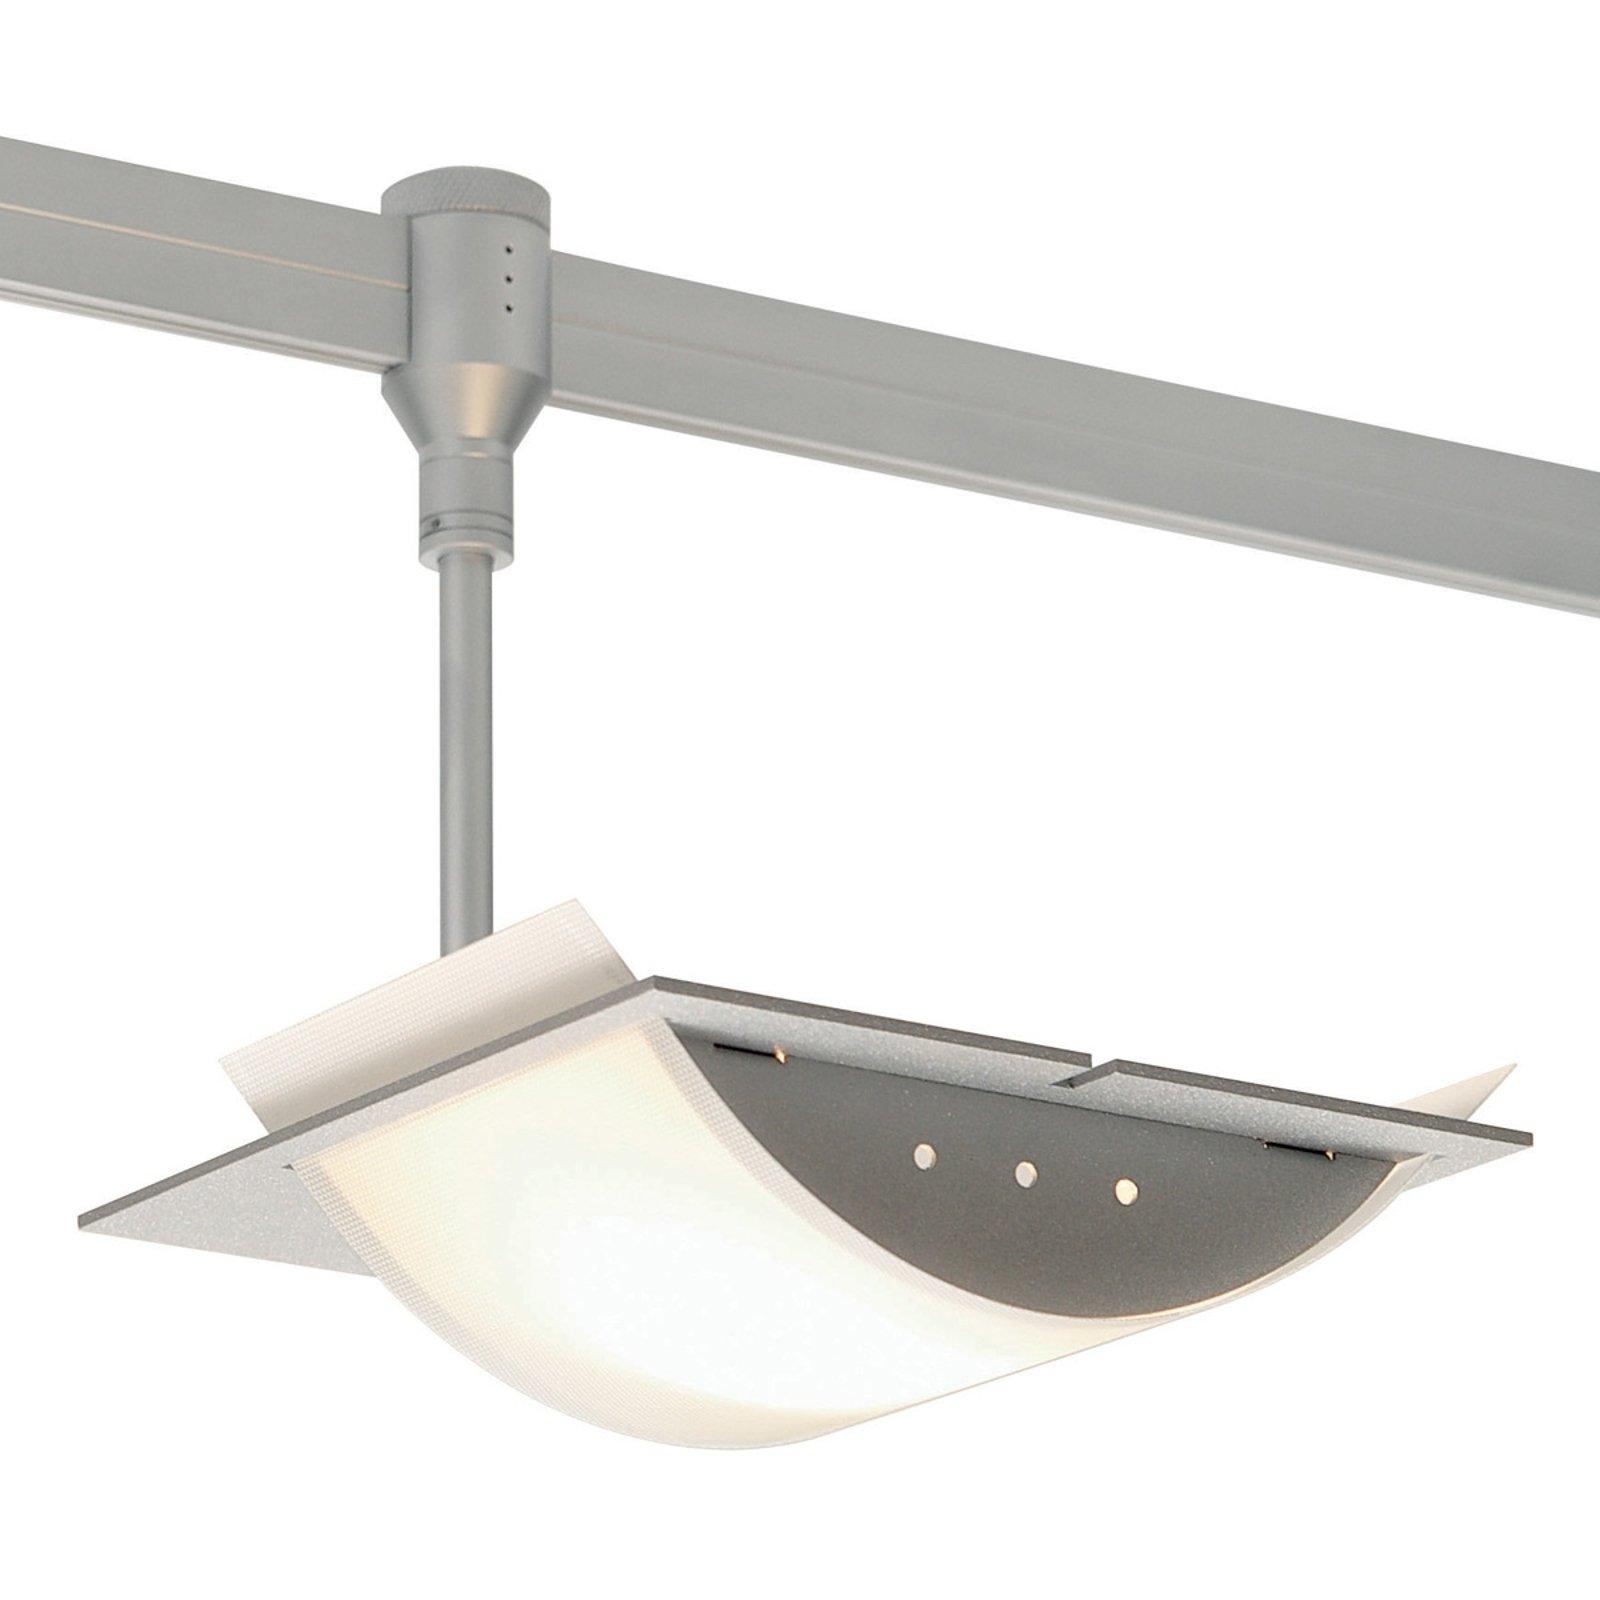 Lampe High Fligh Galerie til Check-In